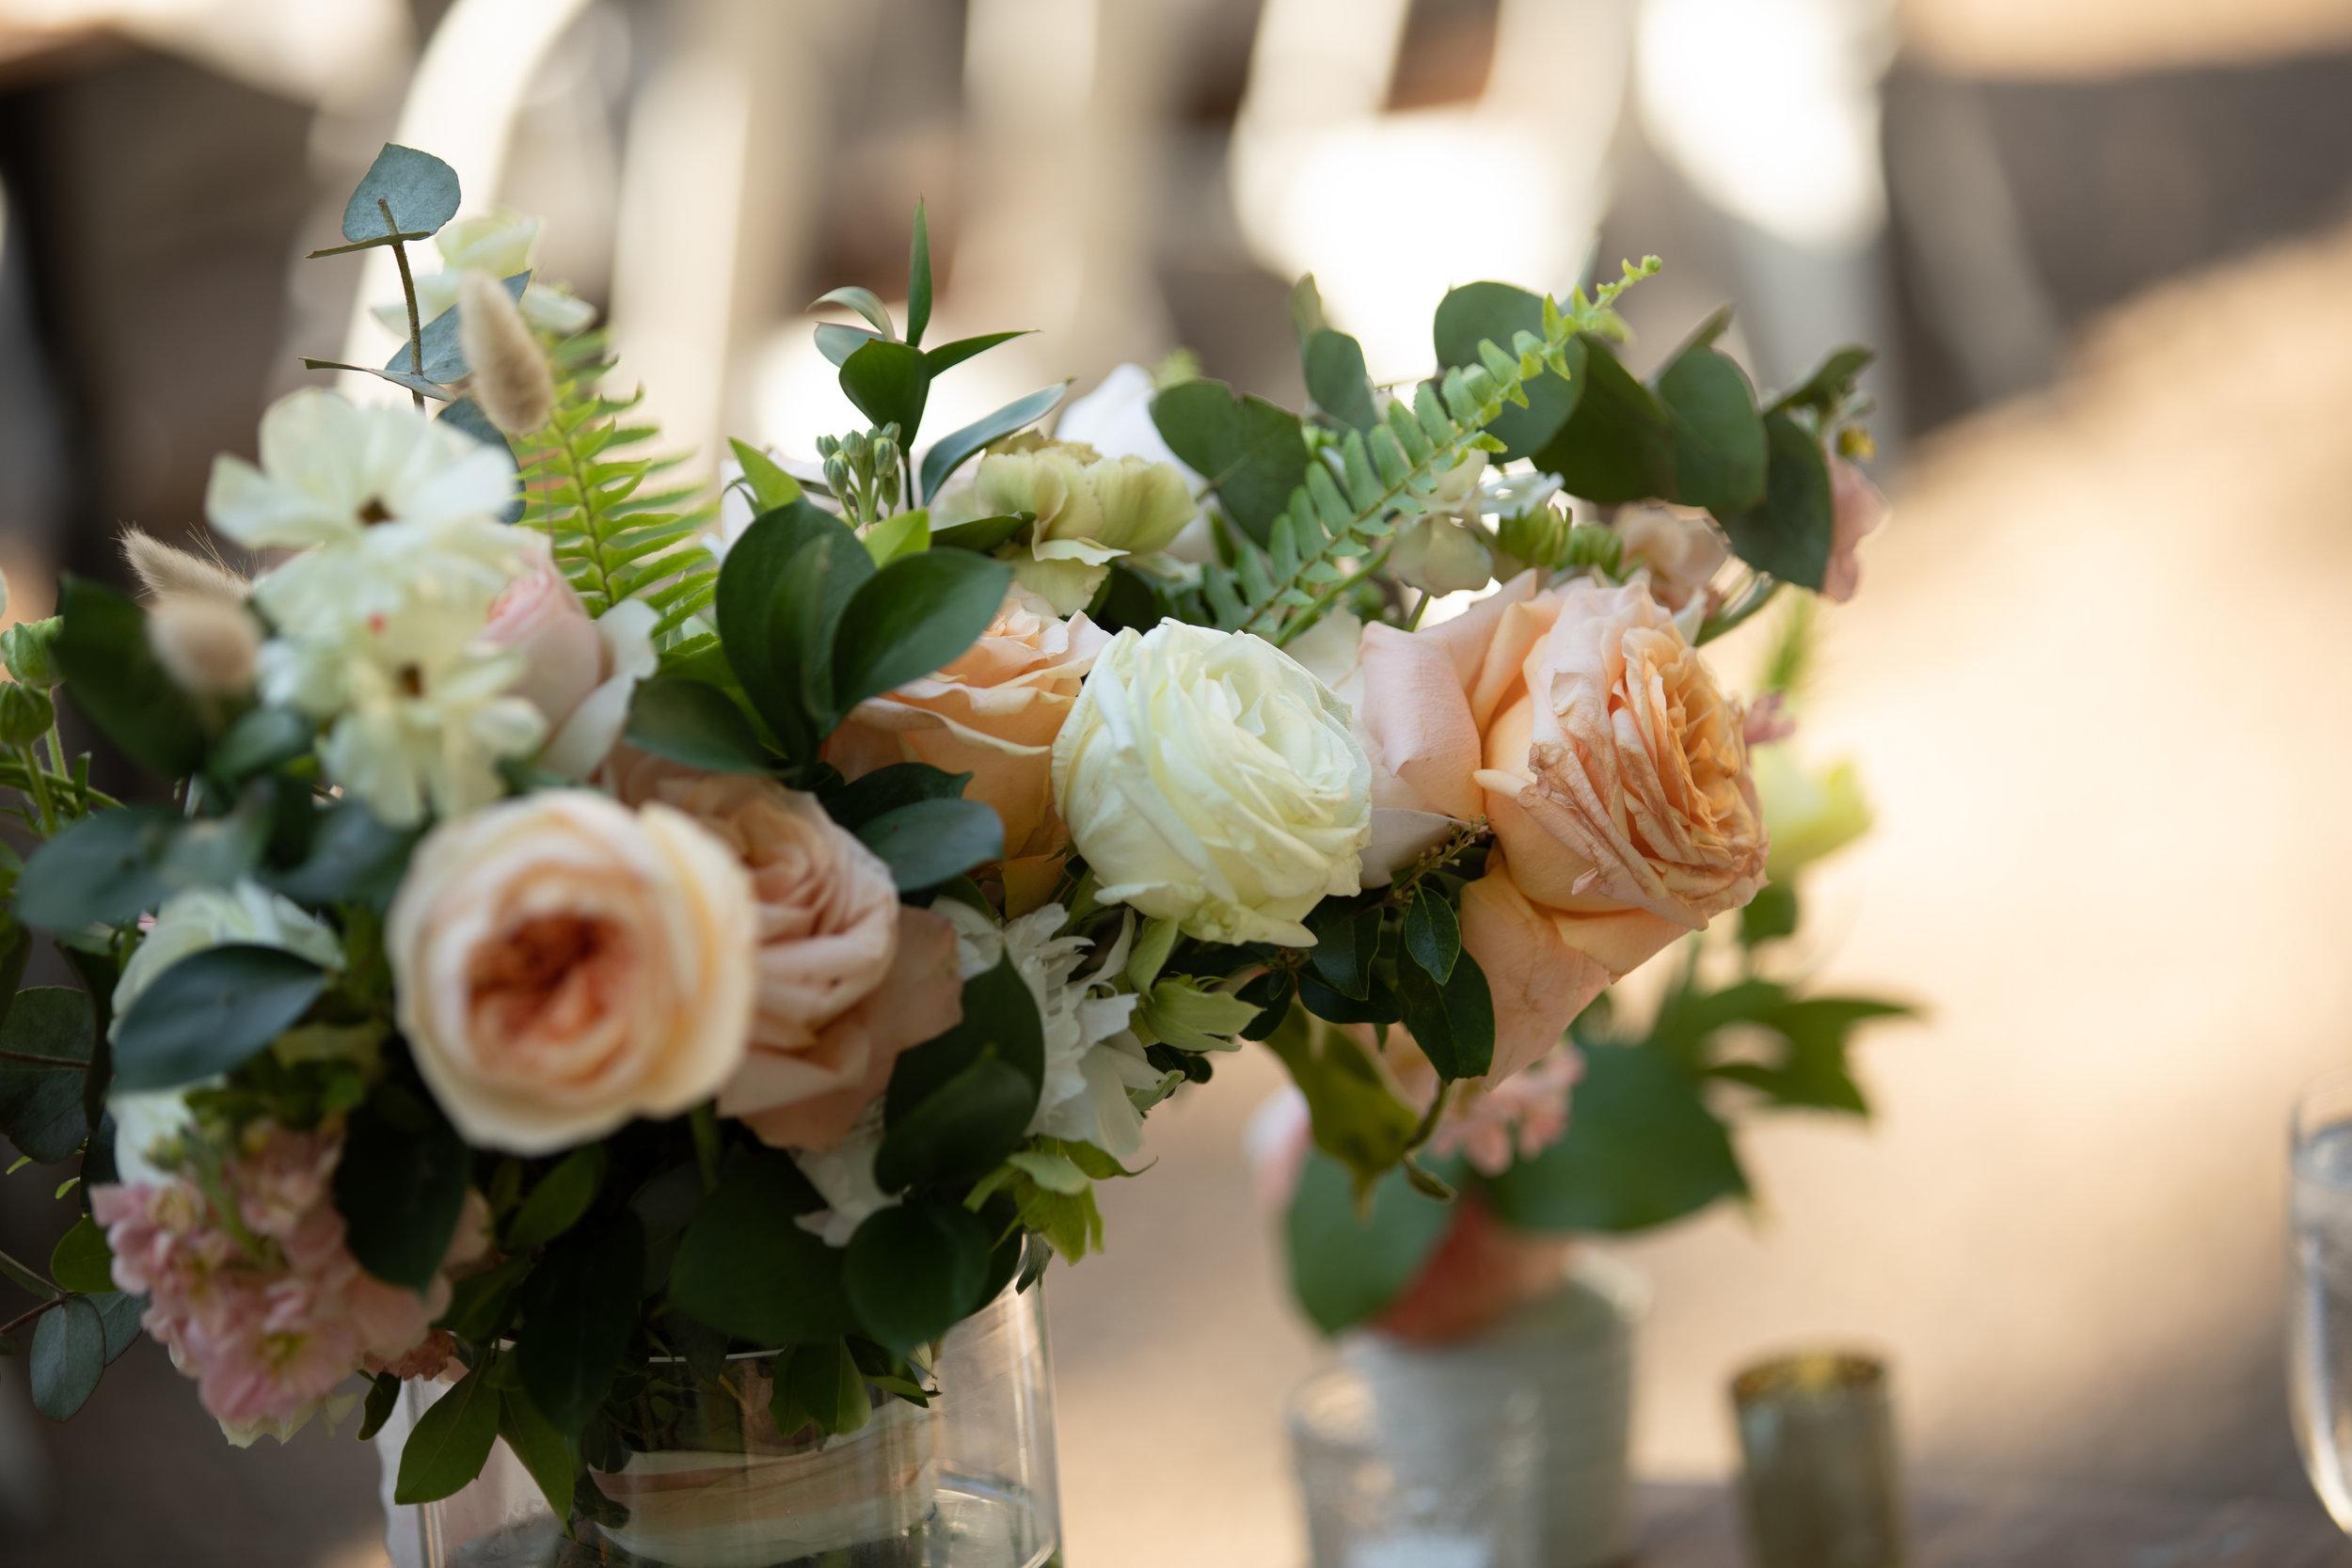 sarah_ikeem_wedding_at_the_parlour_at_manns_chapel_05.18.19-1012-2.jpg